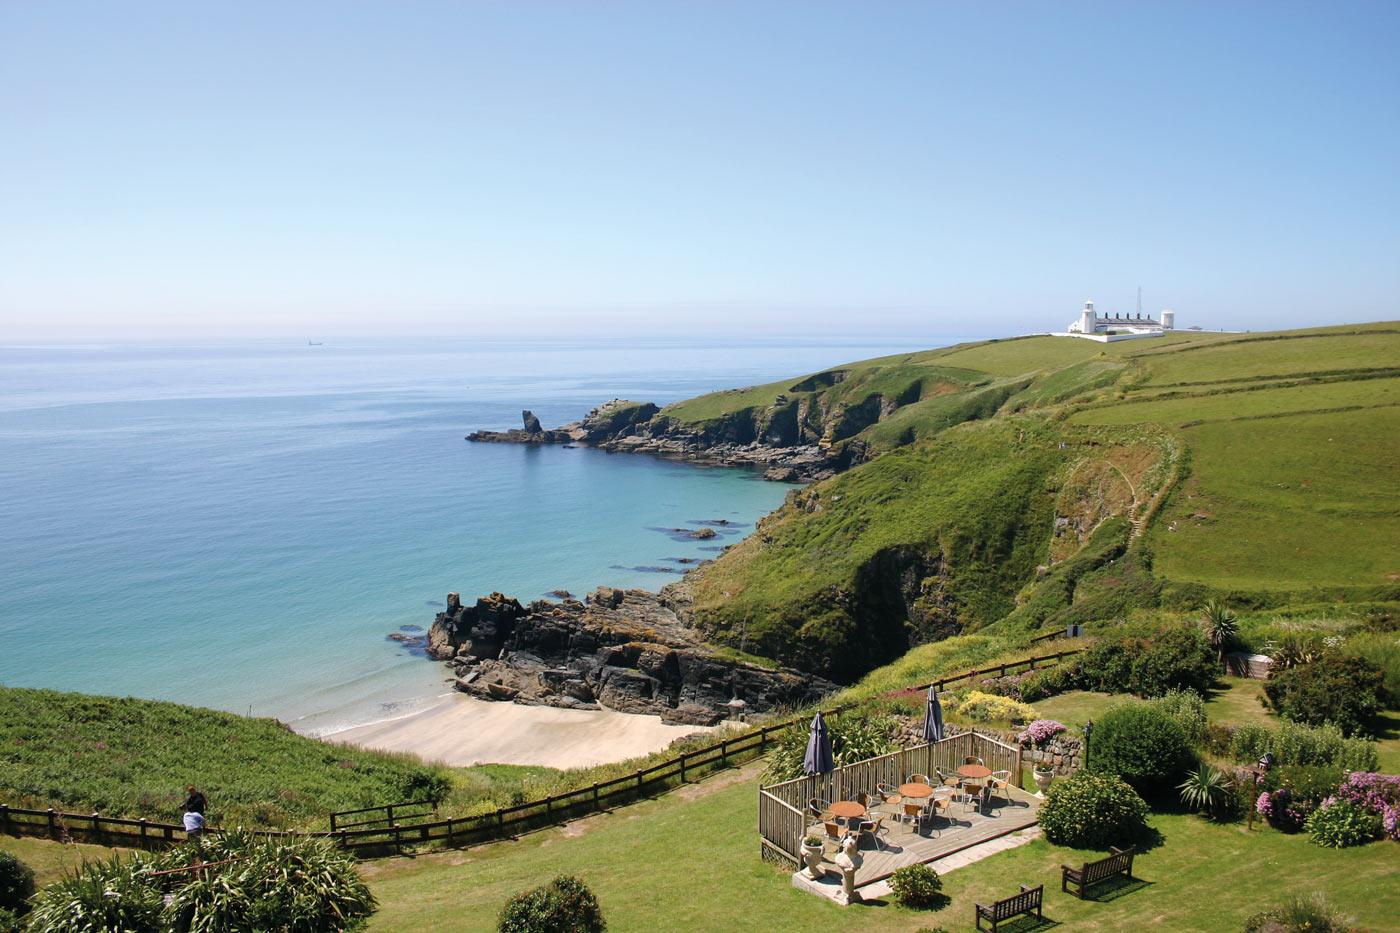 Housel Bay Hotel, Cornish hotels